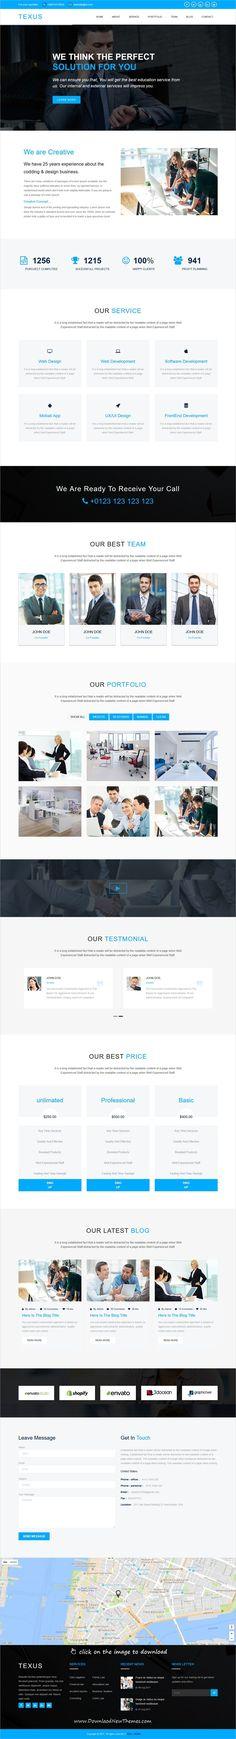 Psychologist Responsive Website Template New Website Templates - everest optimal resume